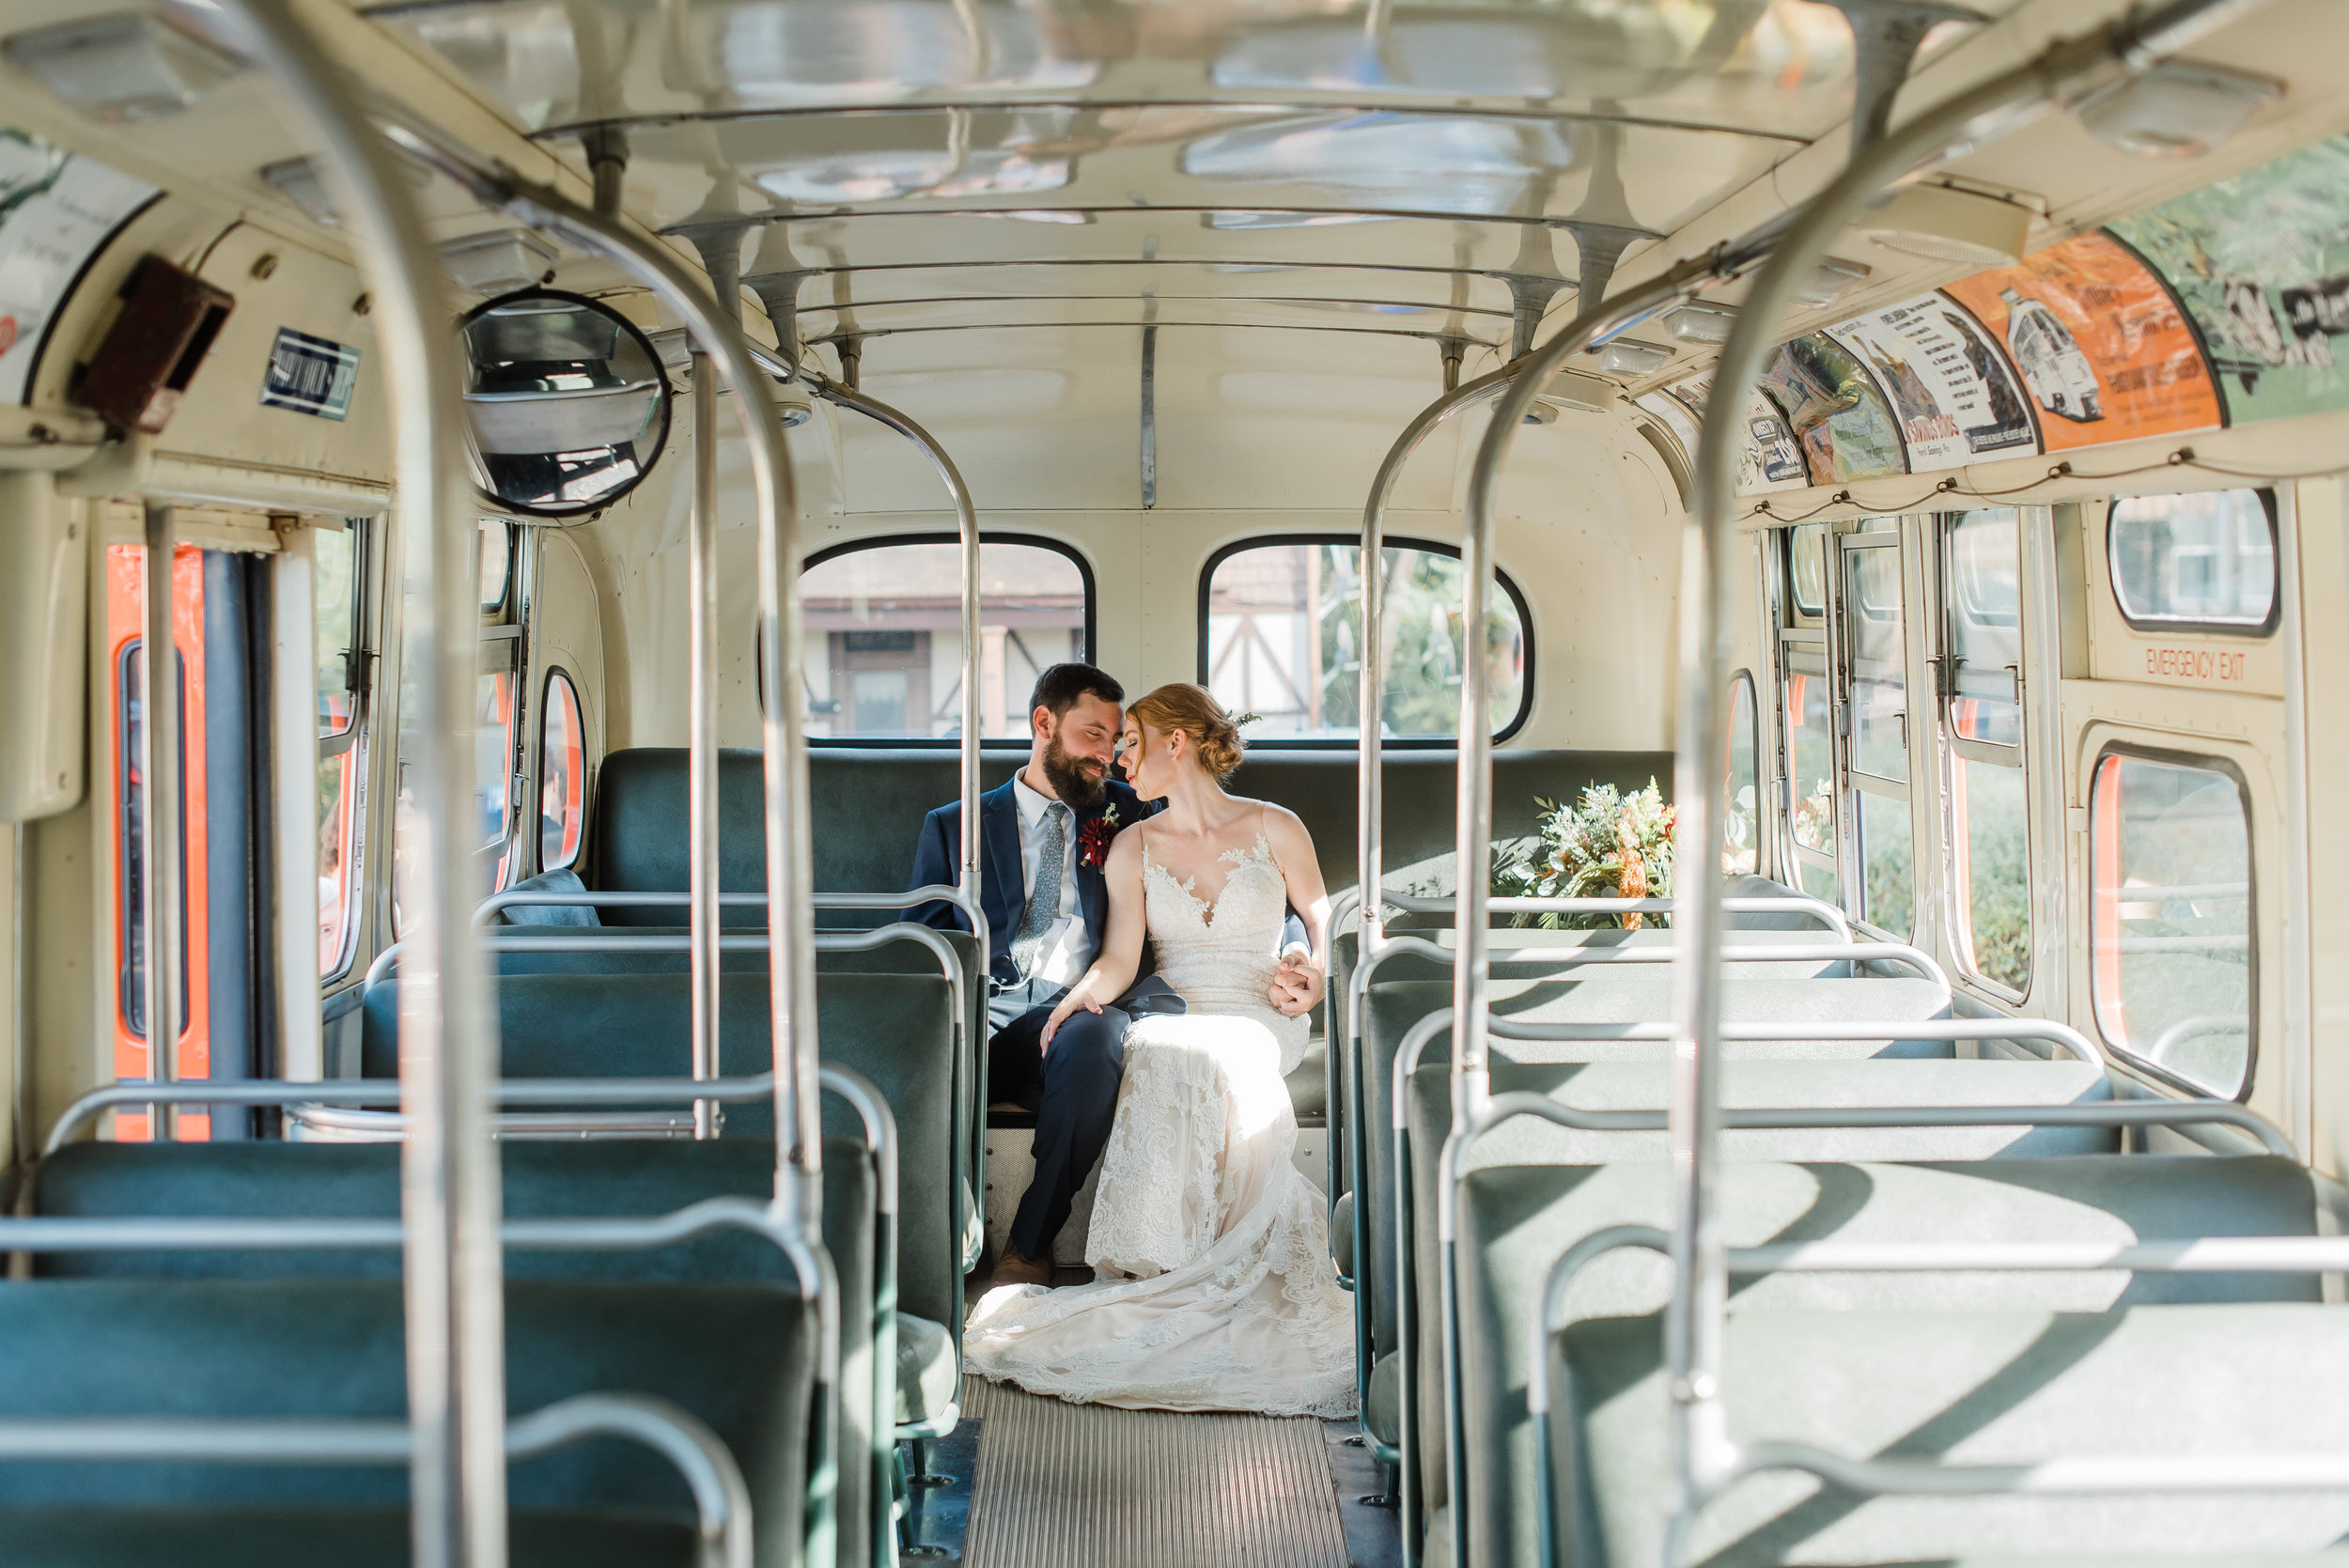 pittsburgh-wedding-photographer-modern-greenery-edgewoodclub-boho0131.jpg